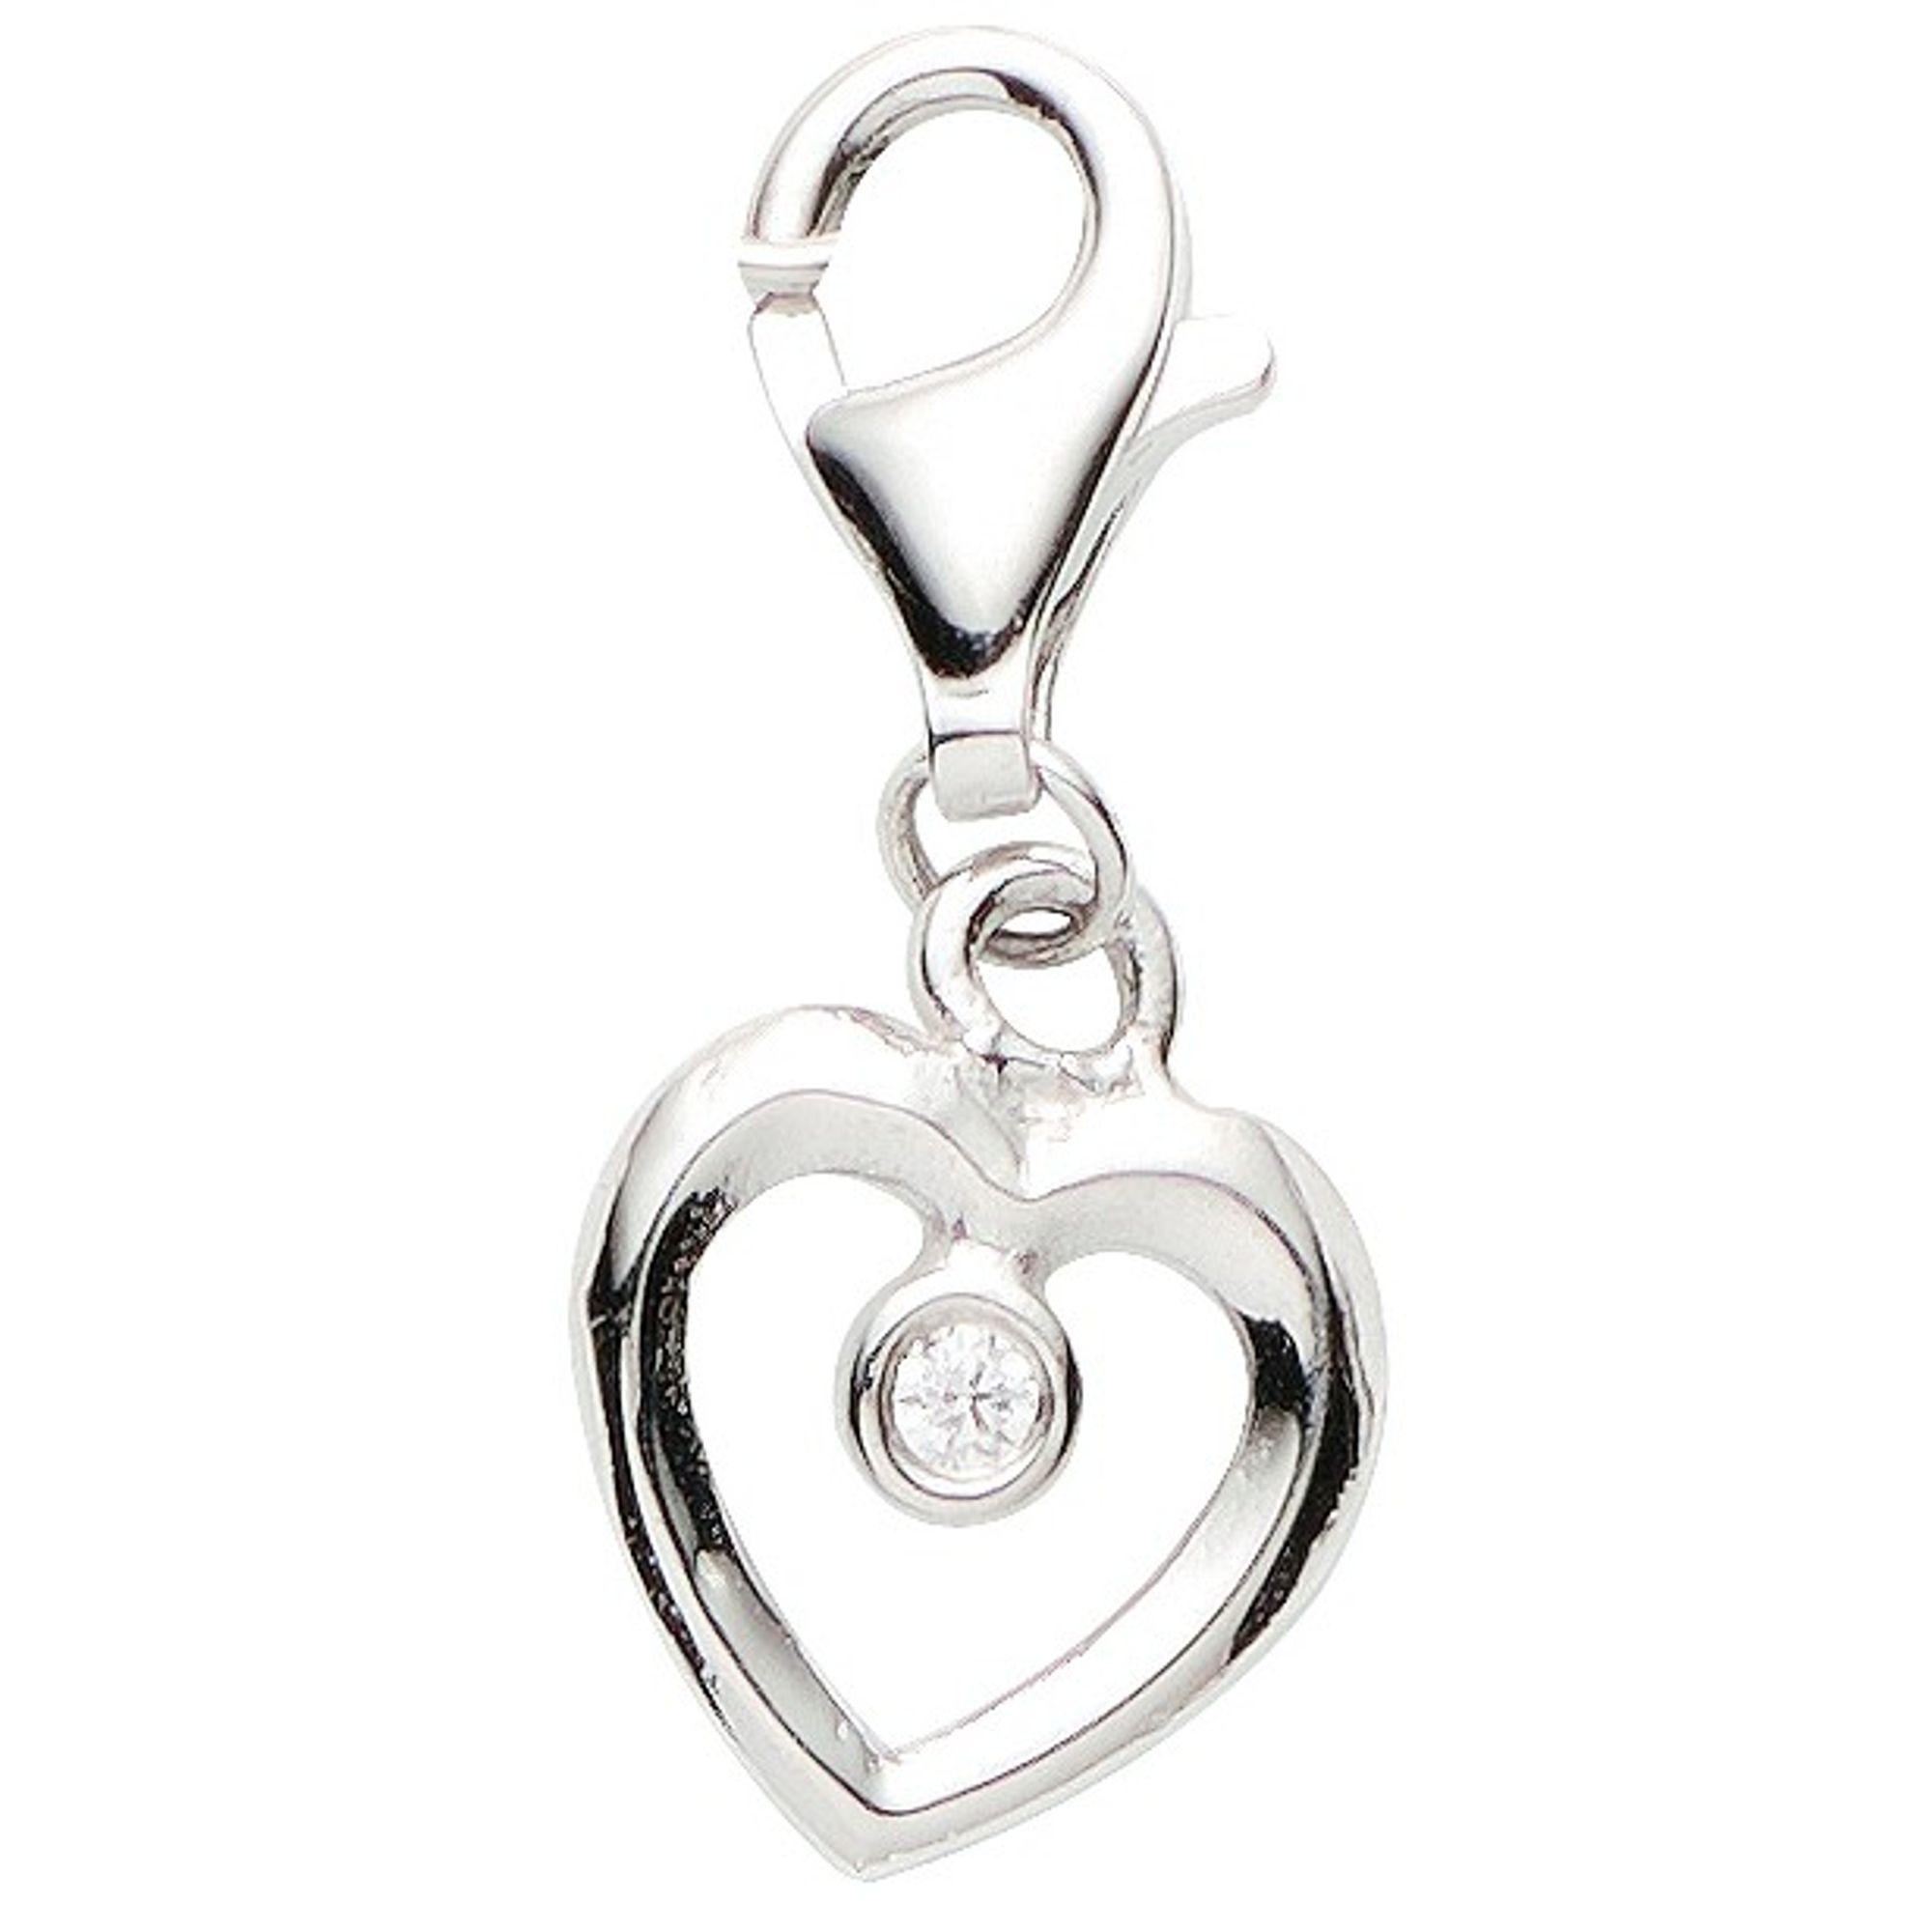 Basic Silber 22.VX345 Damen Charms Herz Silber Zirkonia weiß